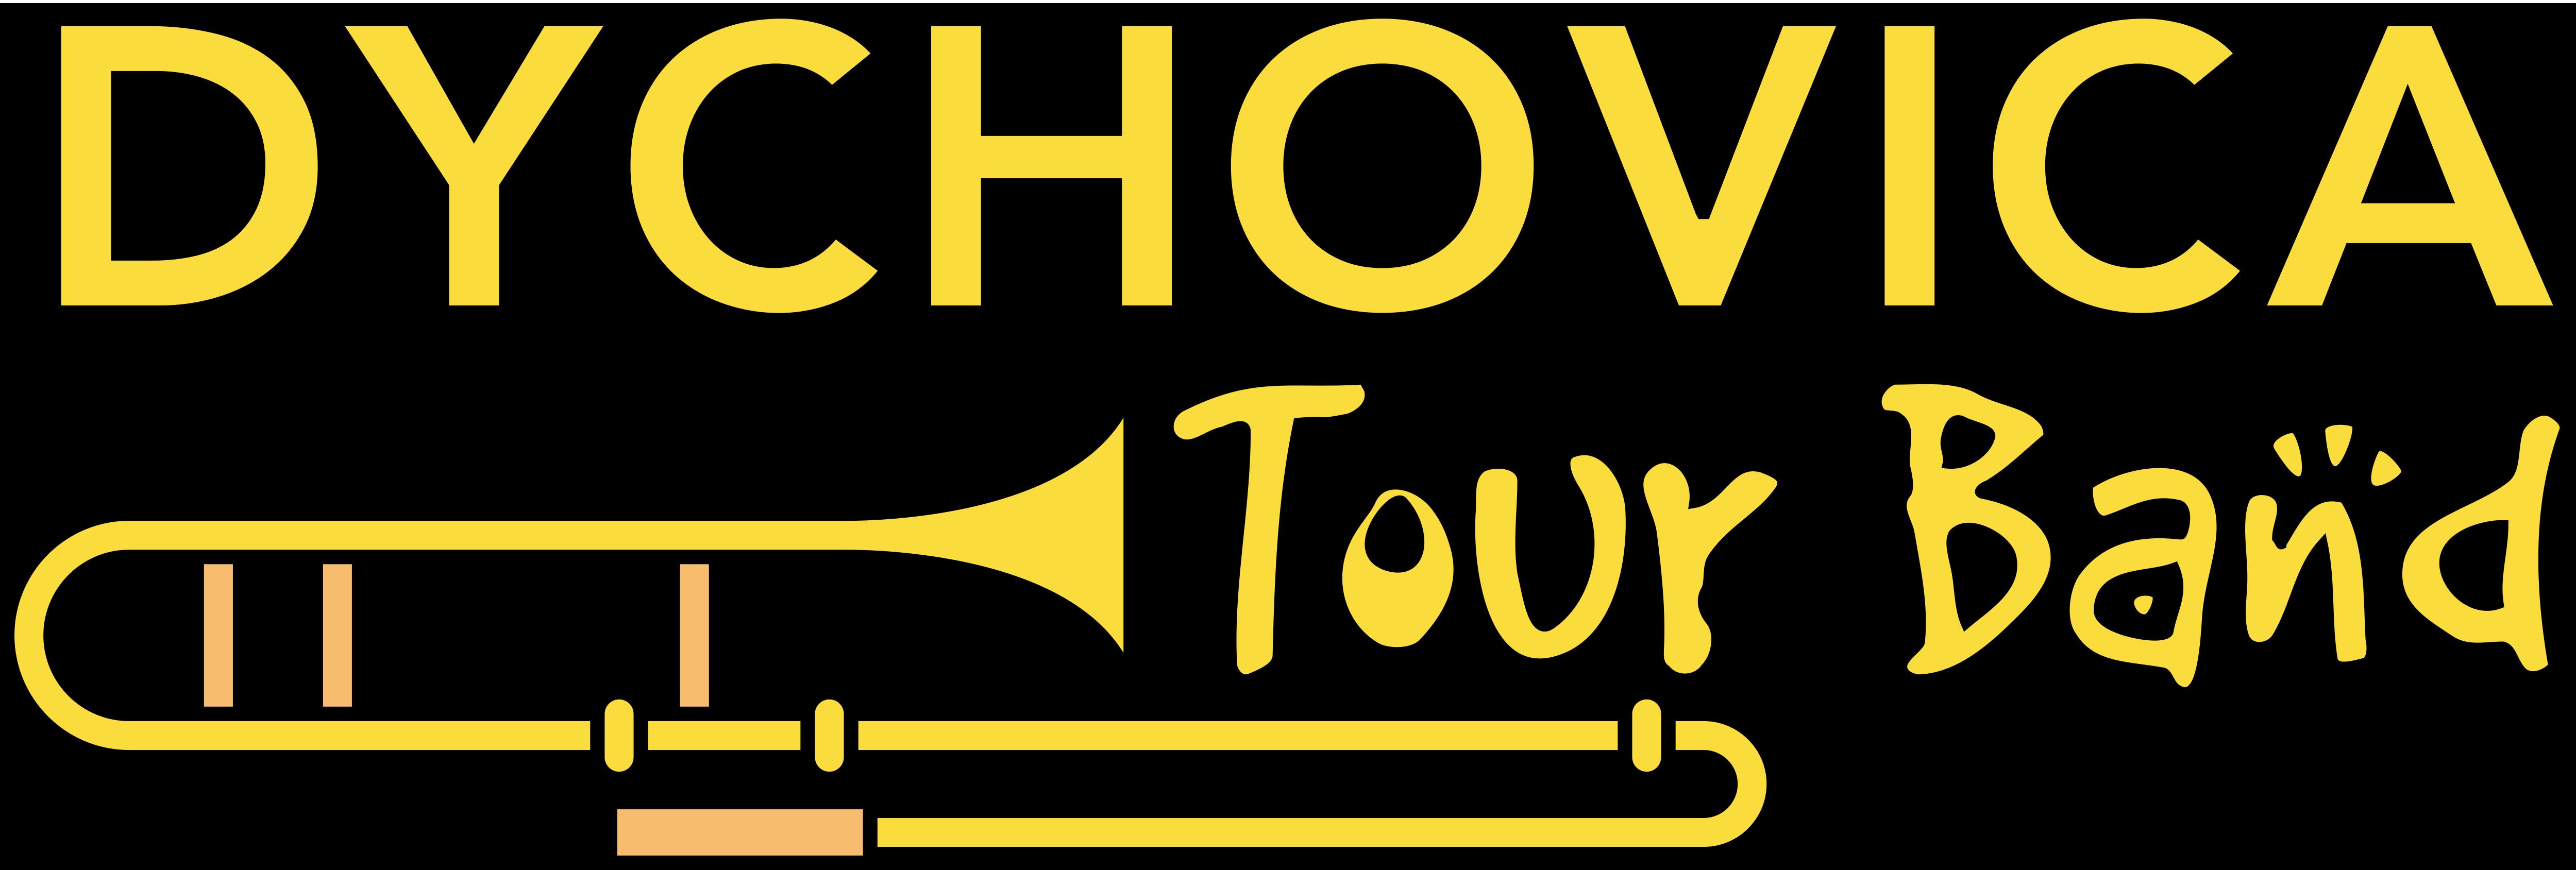 dychovica tour band